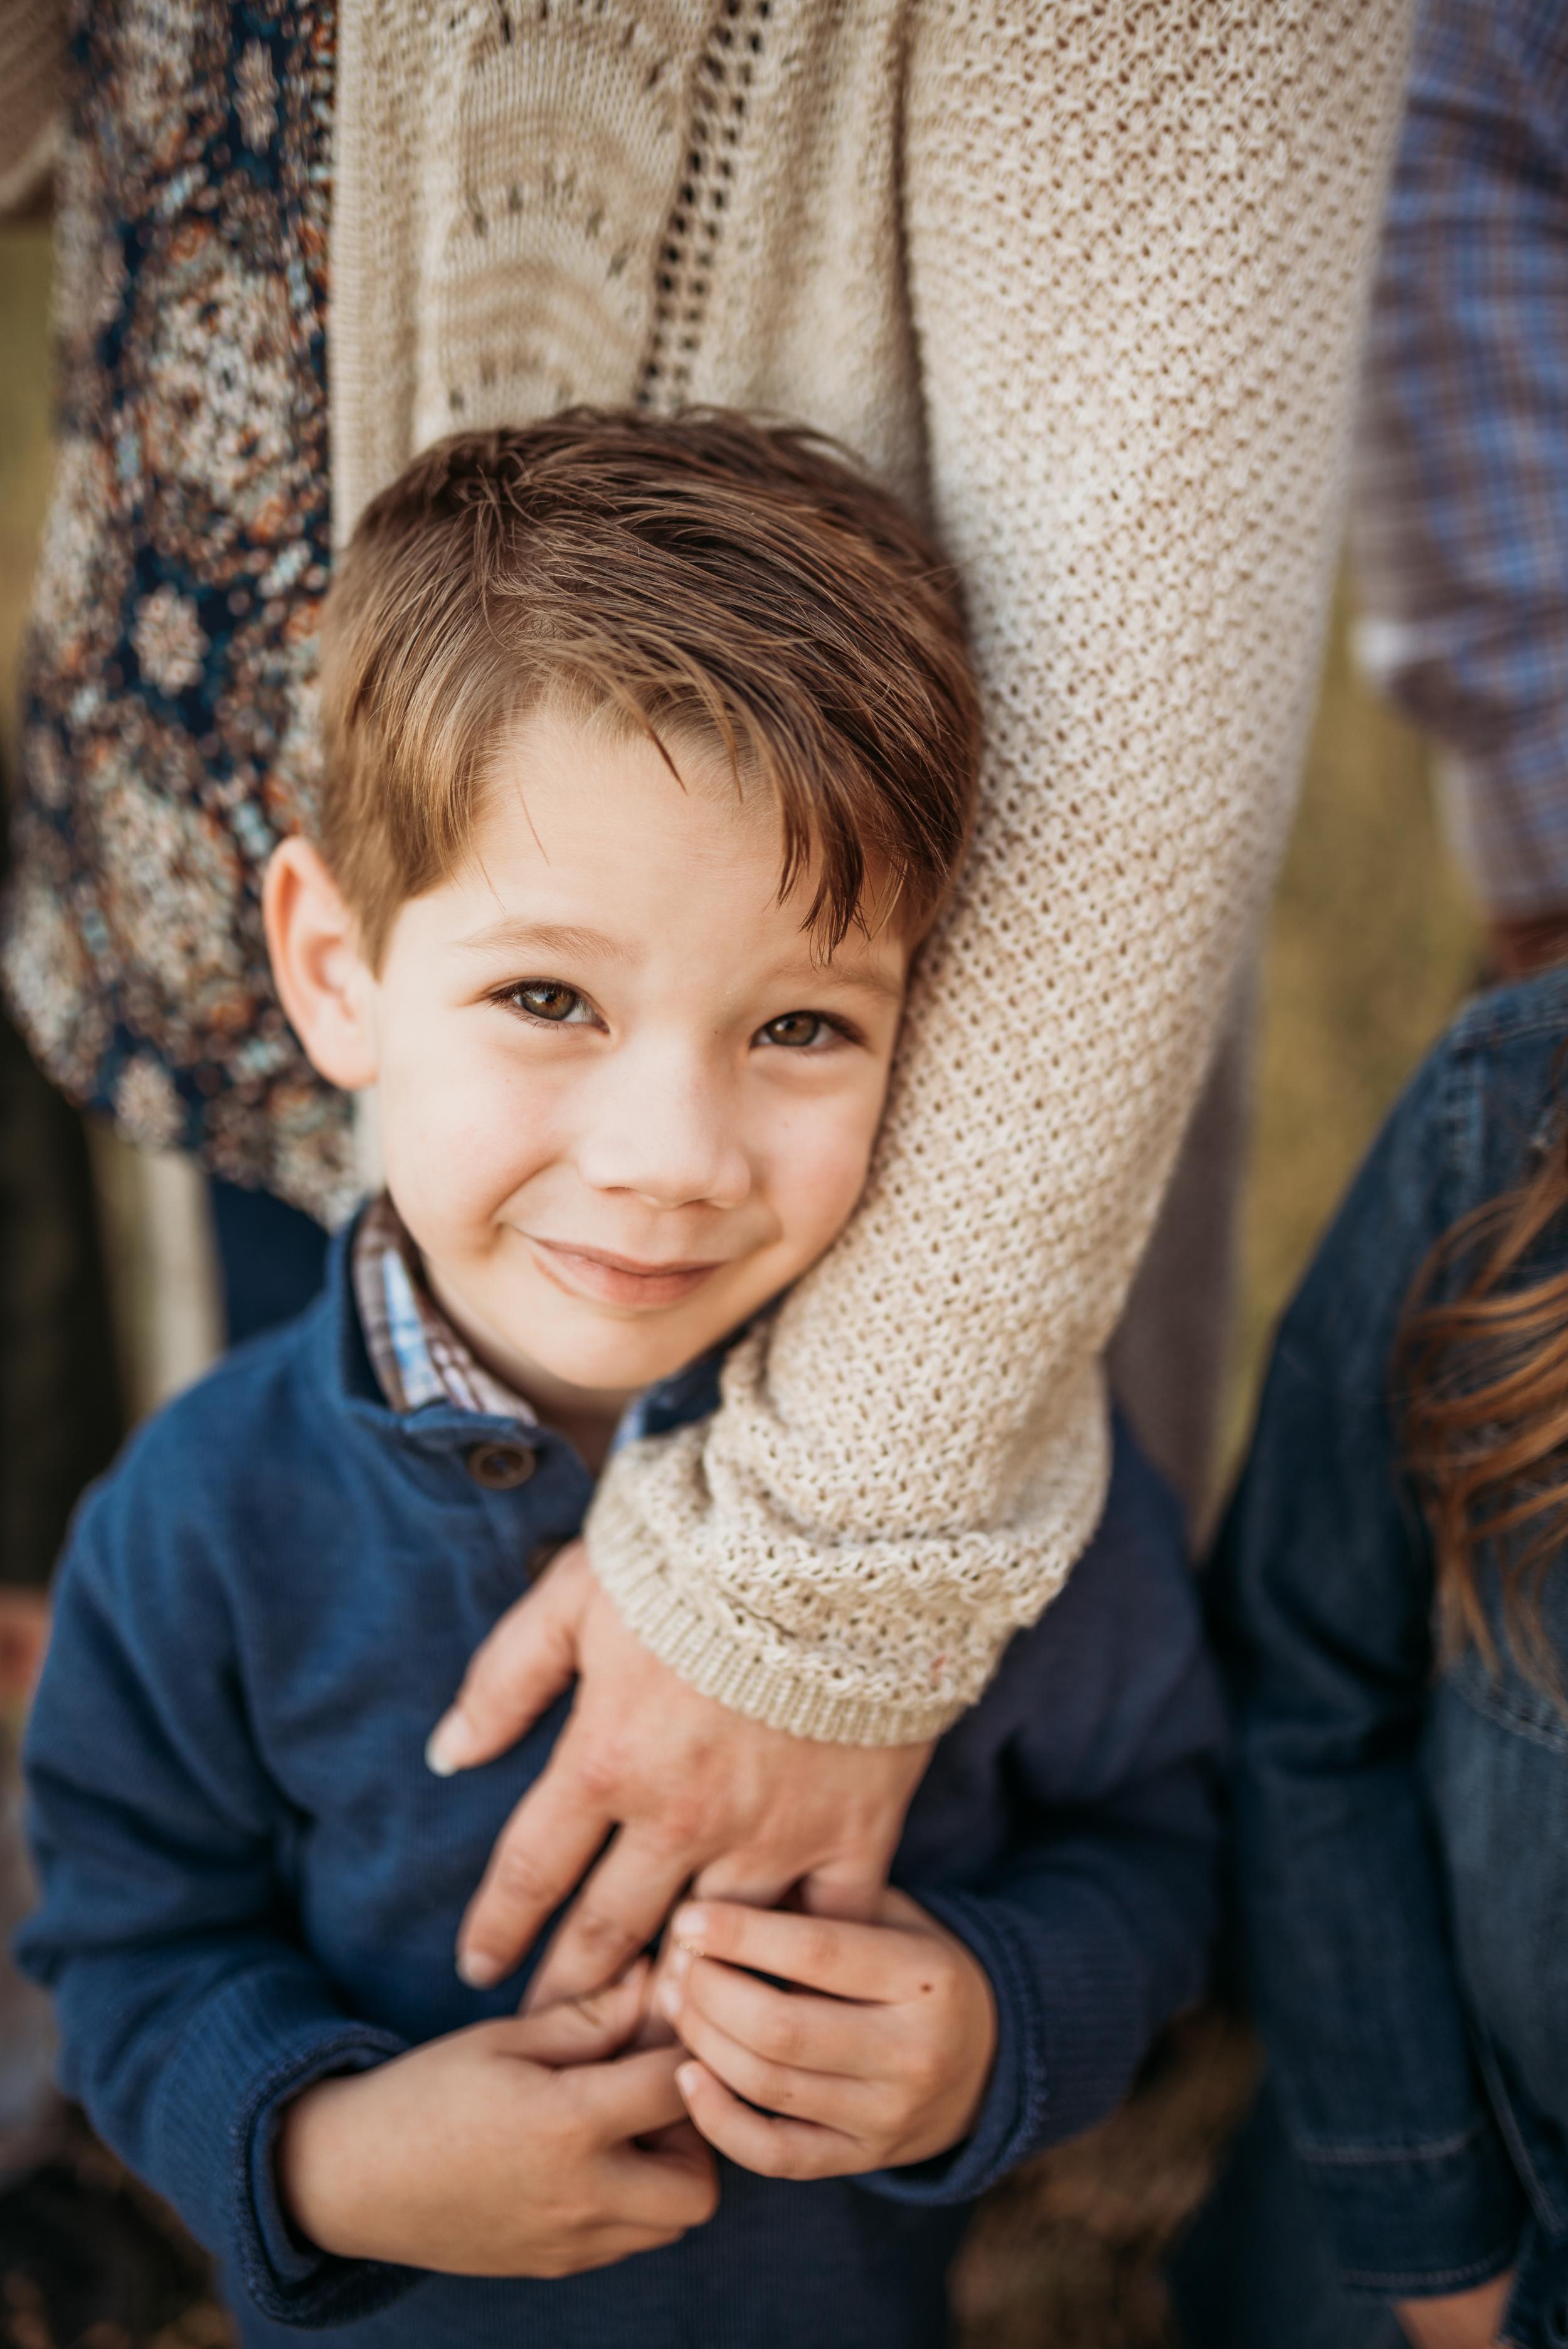 mcpherson kansas child photography, birth, shannon schneider photography, baby